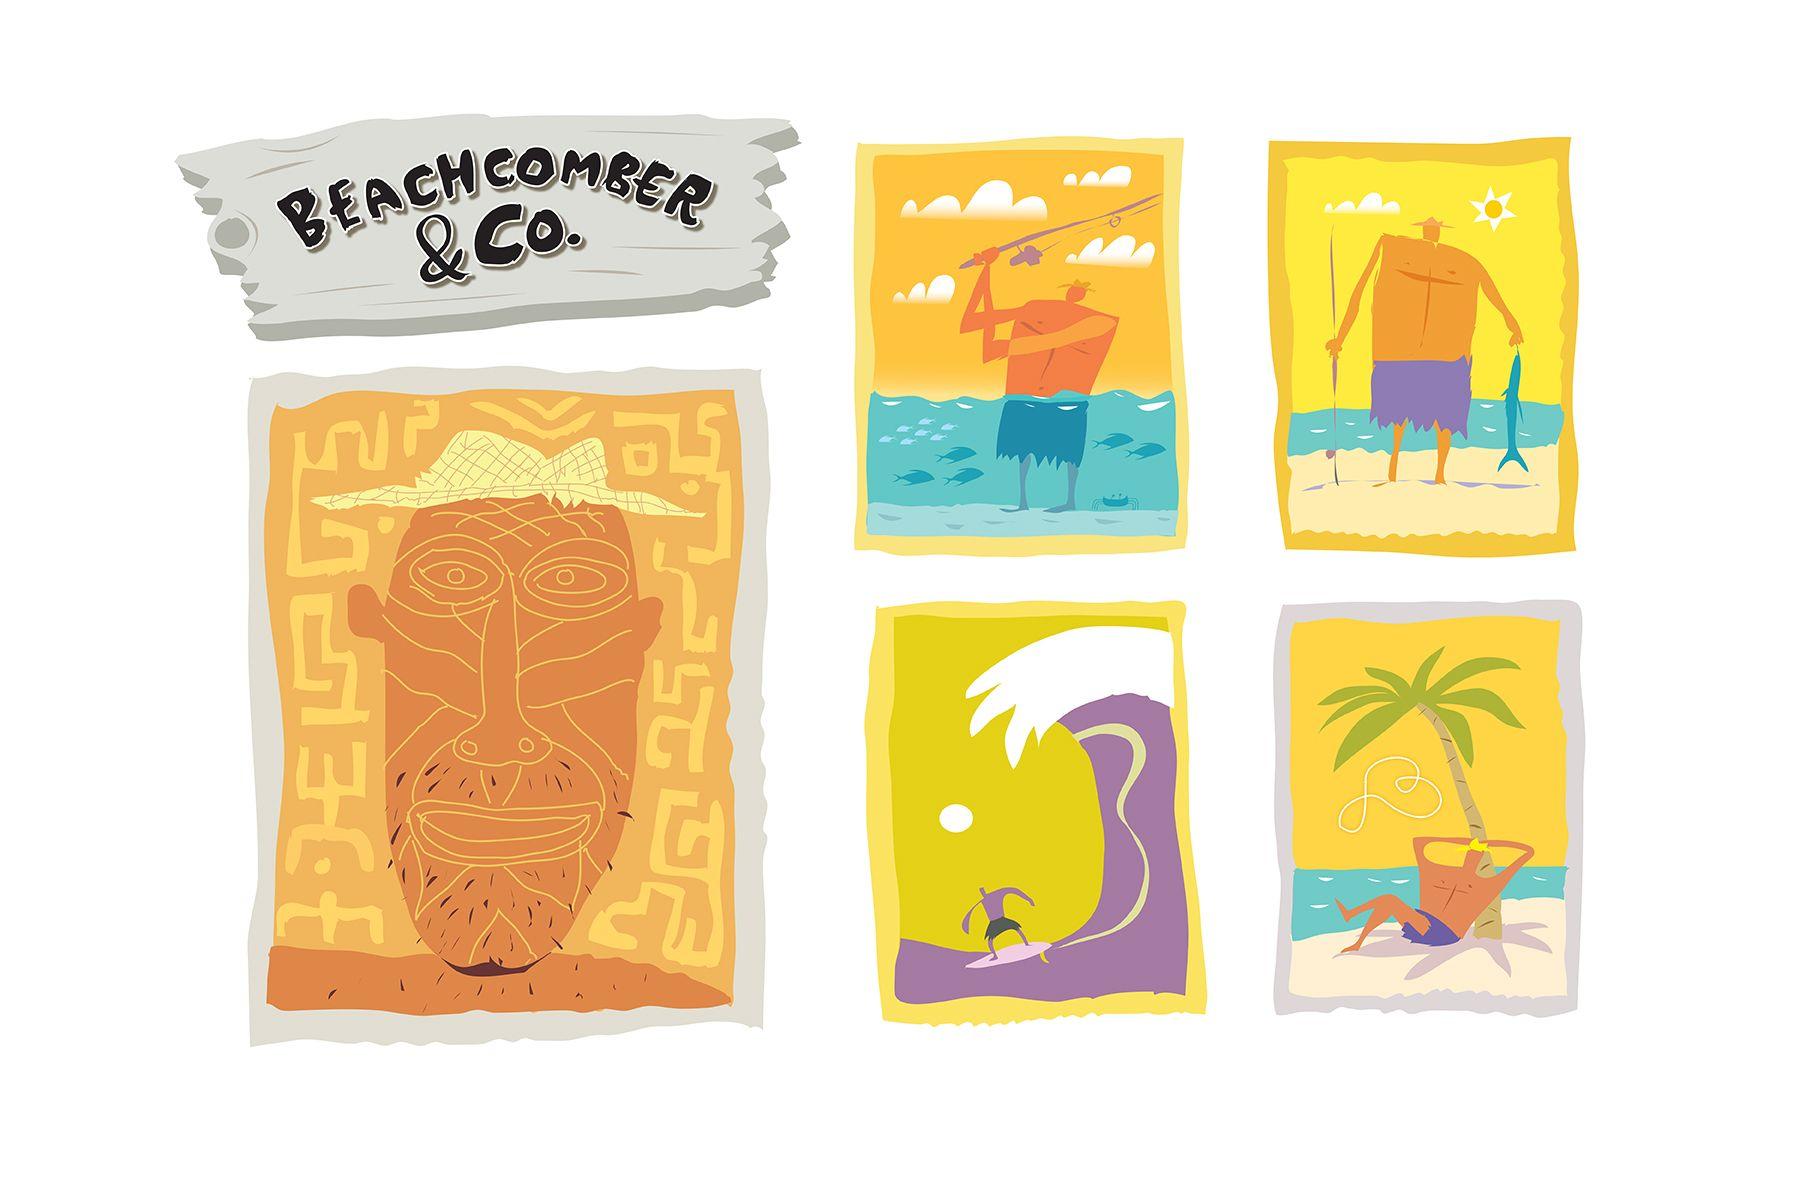 beachcomber17.jpg